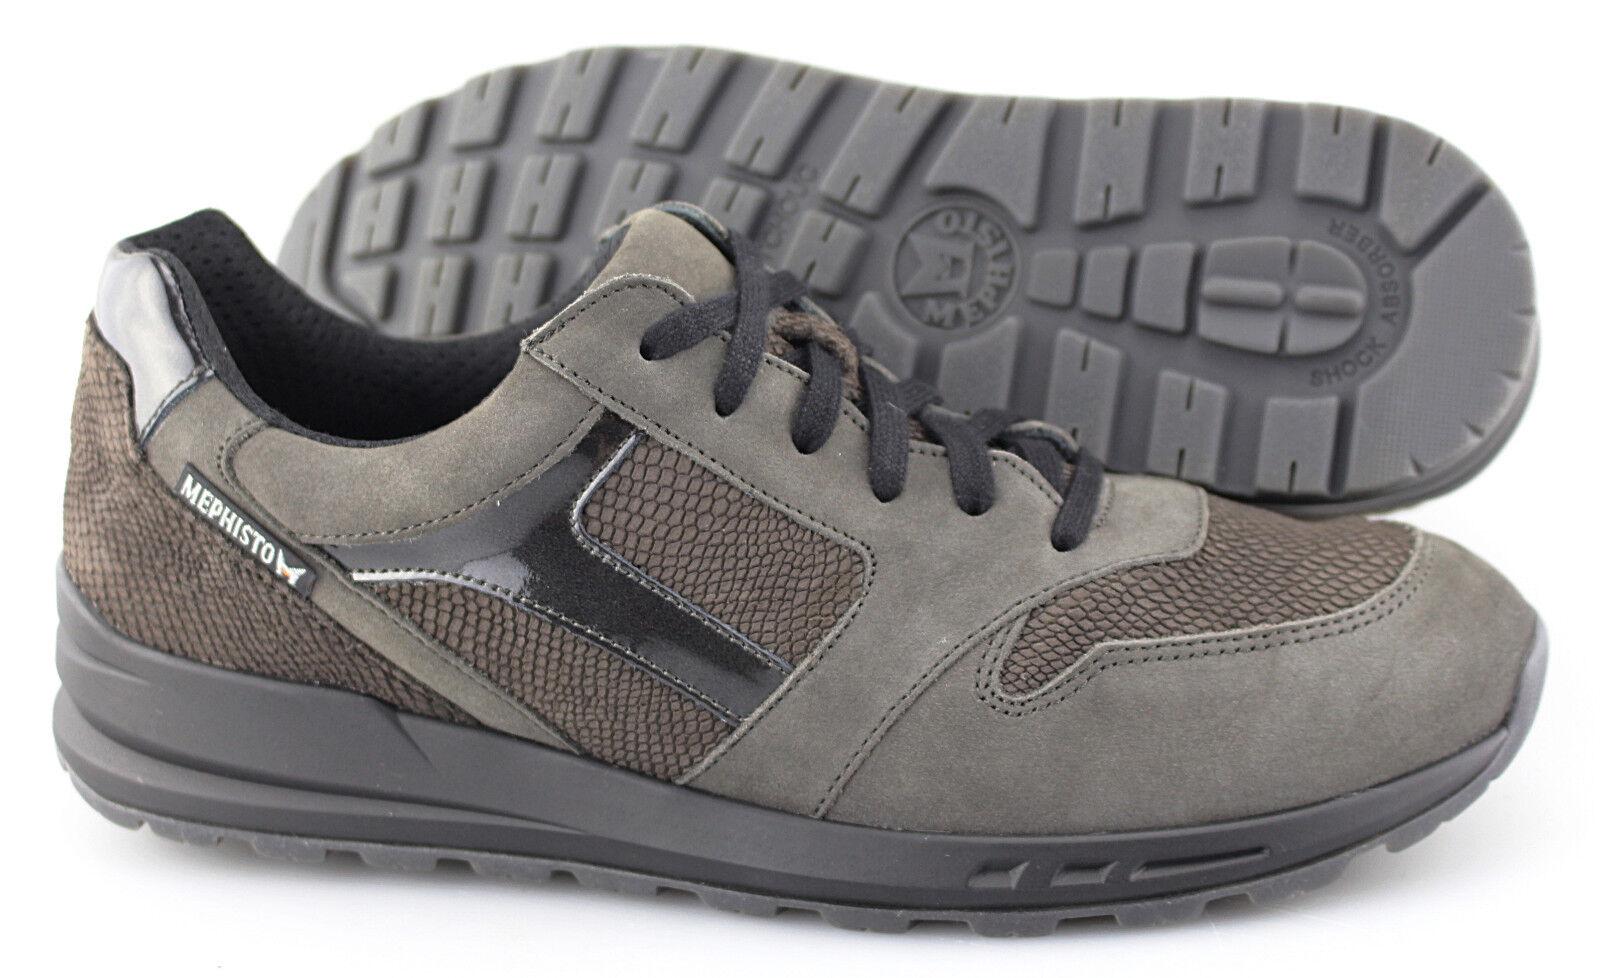 Women's MEPHISTO 'Cross' Grey Bucksoft Leather Sneakers Size US 11